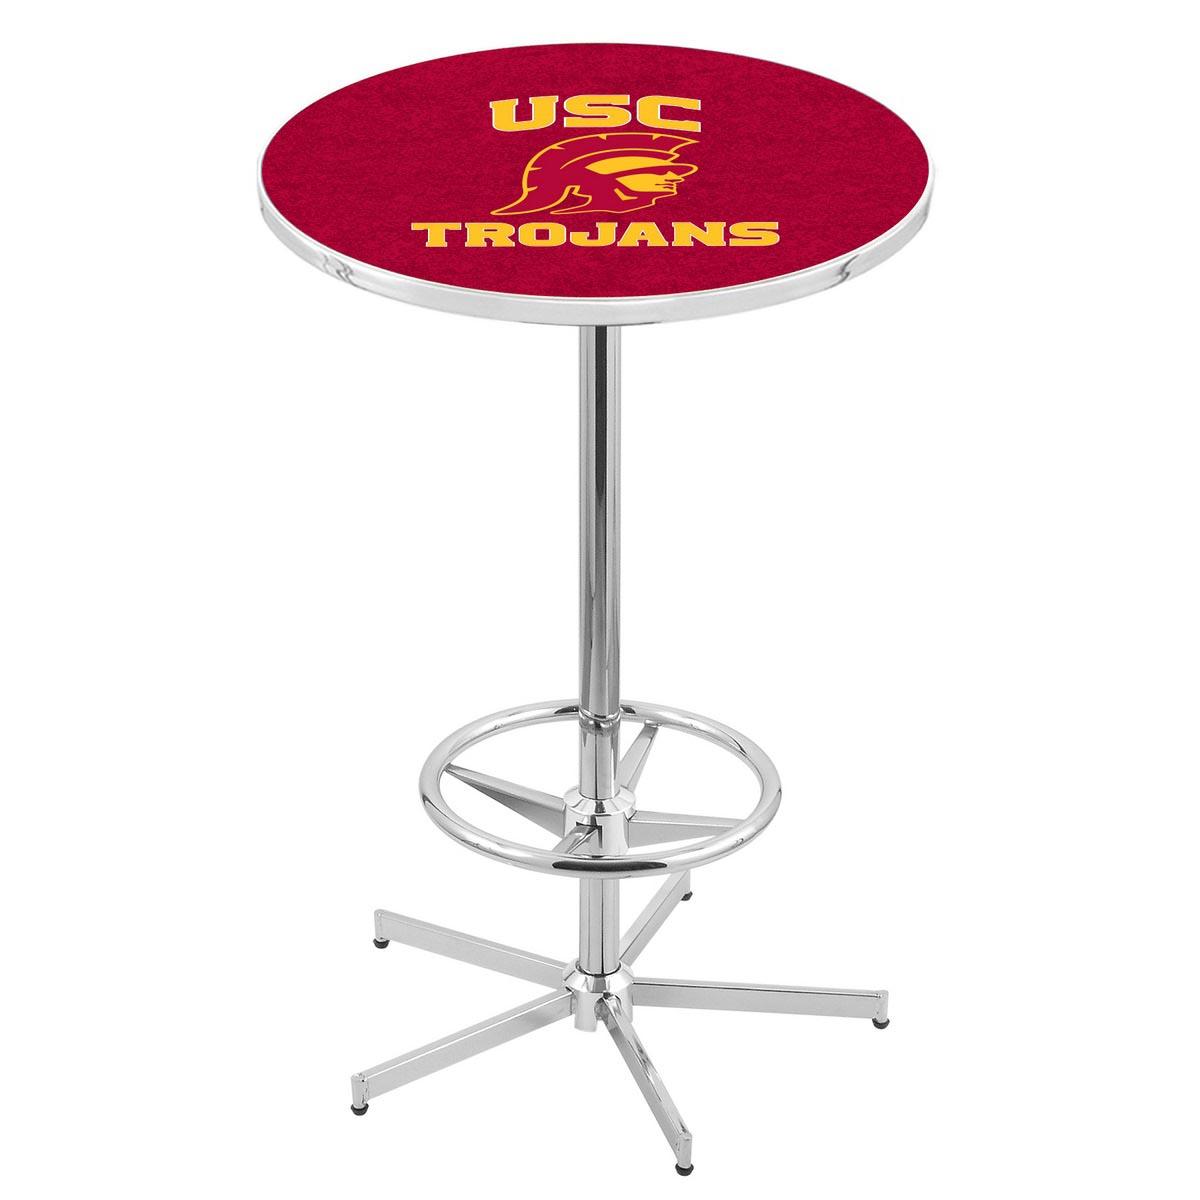 High-class Chrome Usc Trojans Pub Table Product Photo